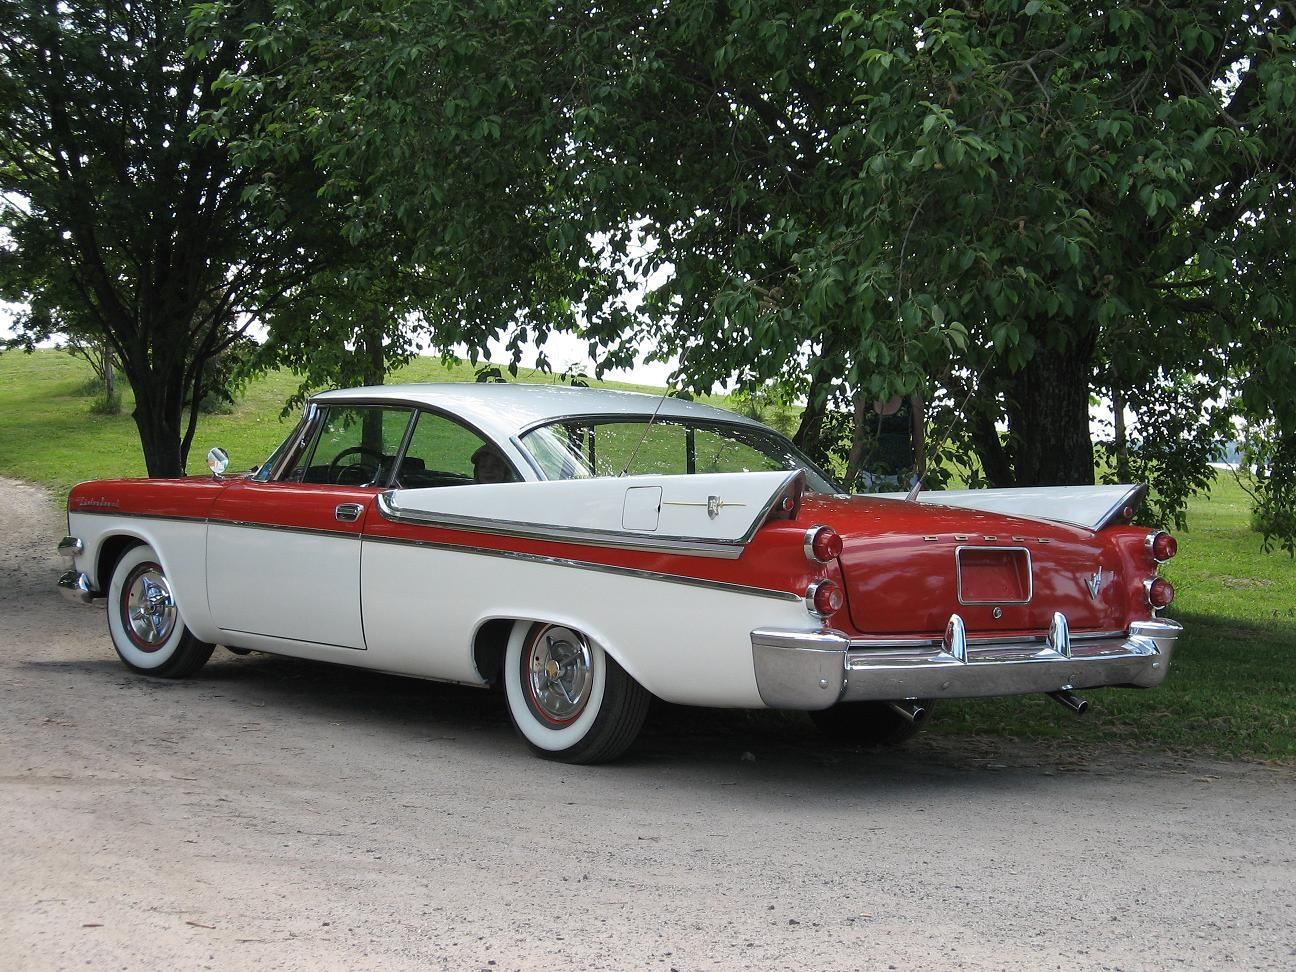 1957 dodge custom royal 2 d ht 325 cid v8 with twin carbs for 1957 dodge 2 door hardtop